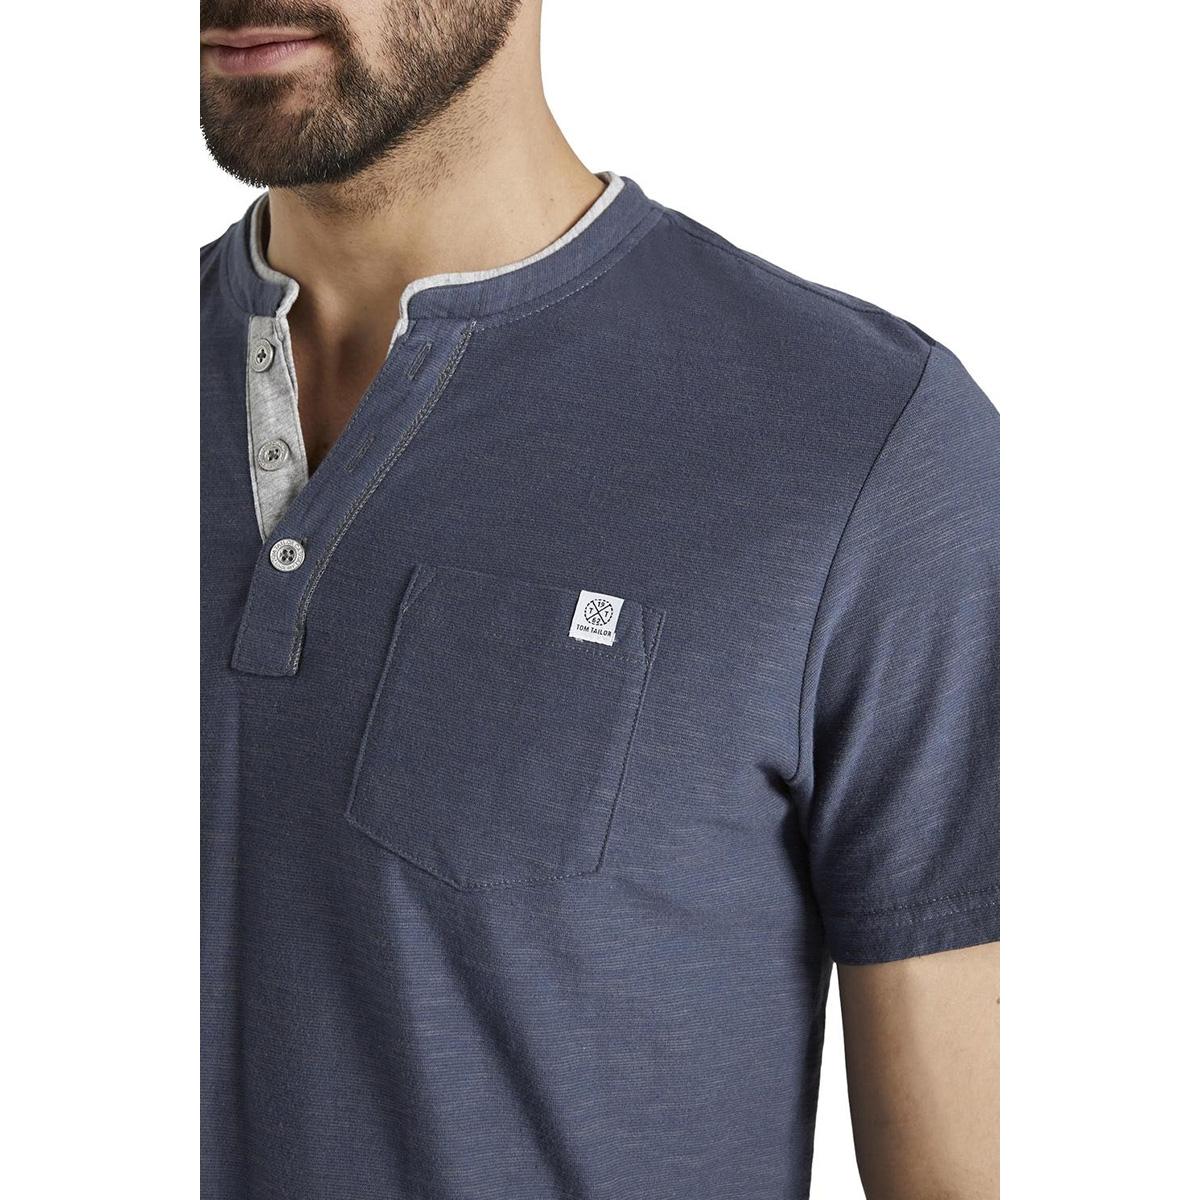 gestreept henley hemd 1016145xx10 tom tailor t-shirt 16061